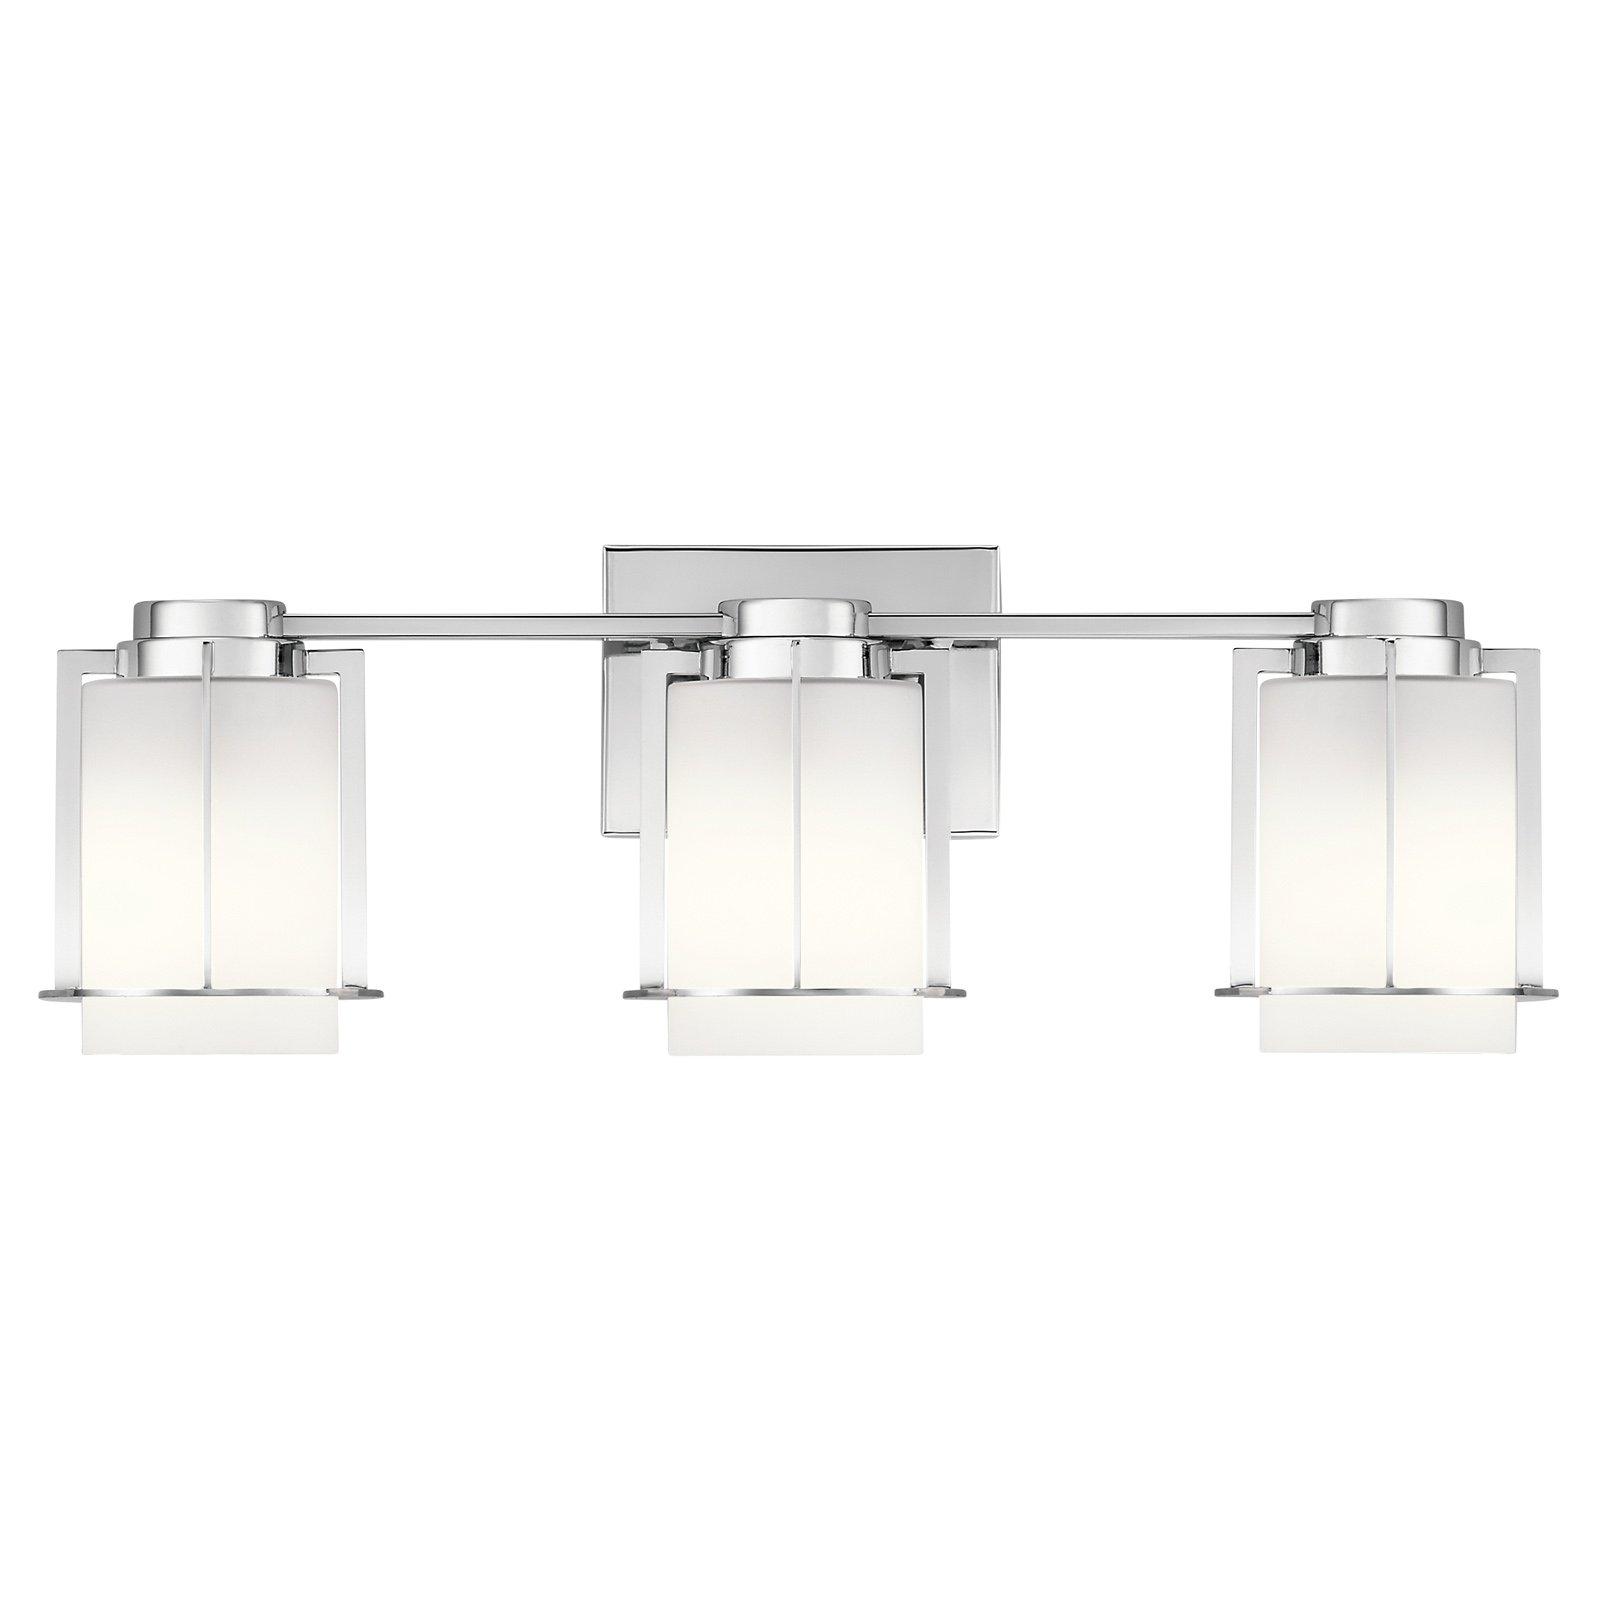 Kichler Chagrin 3 Light Bathroom Vanity Light Bathroom Vanity